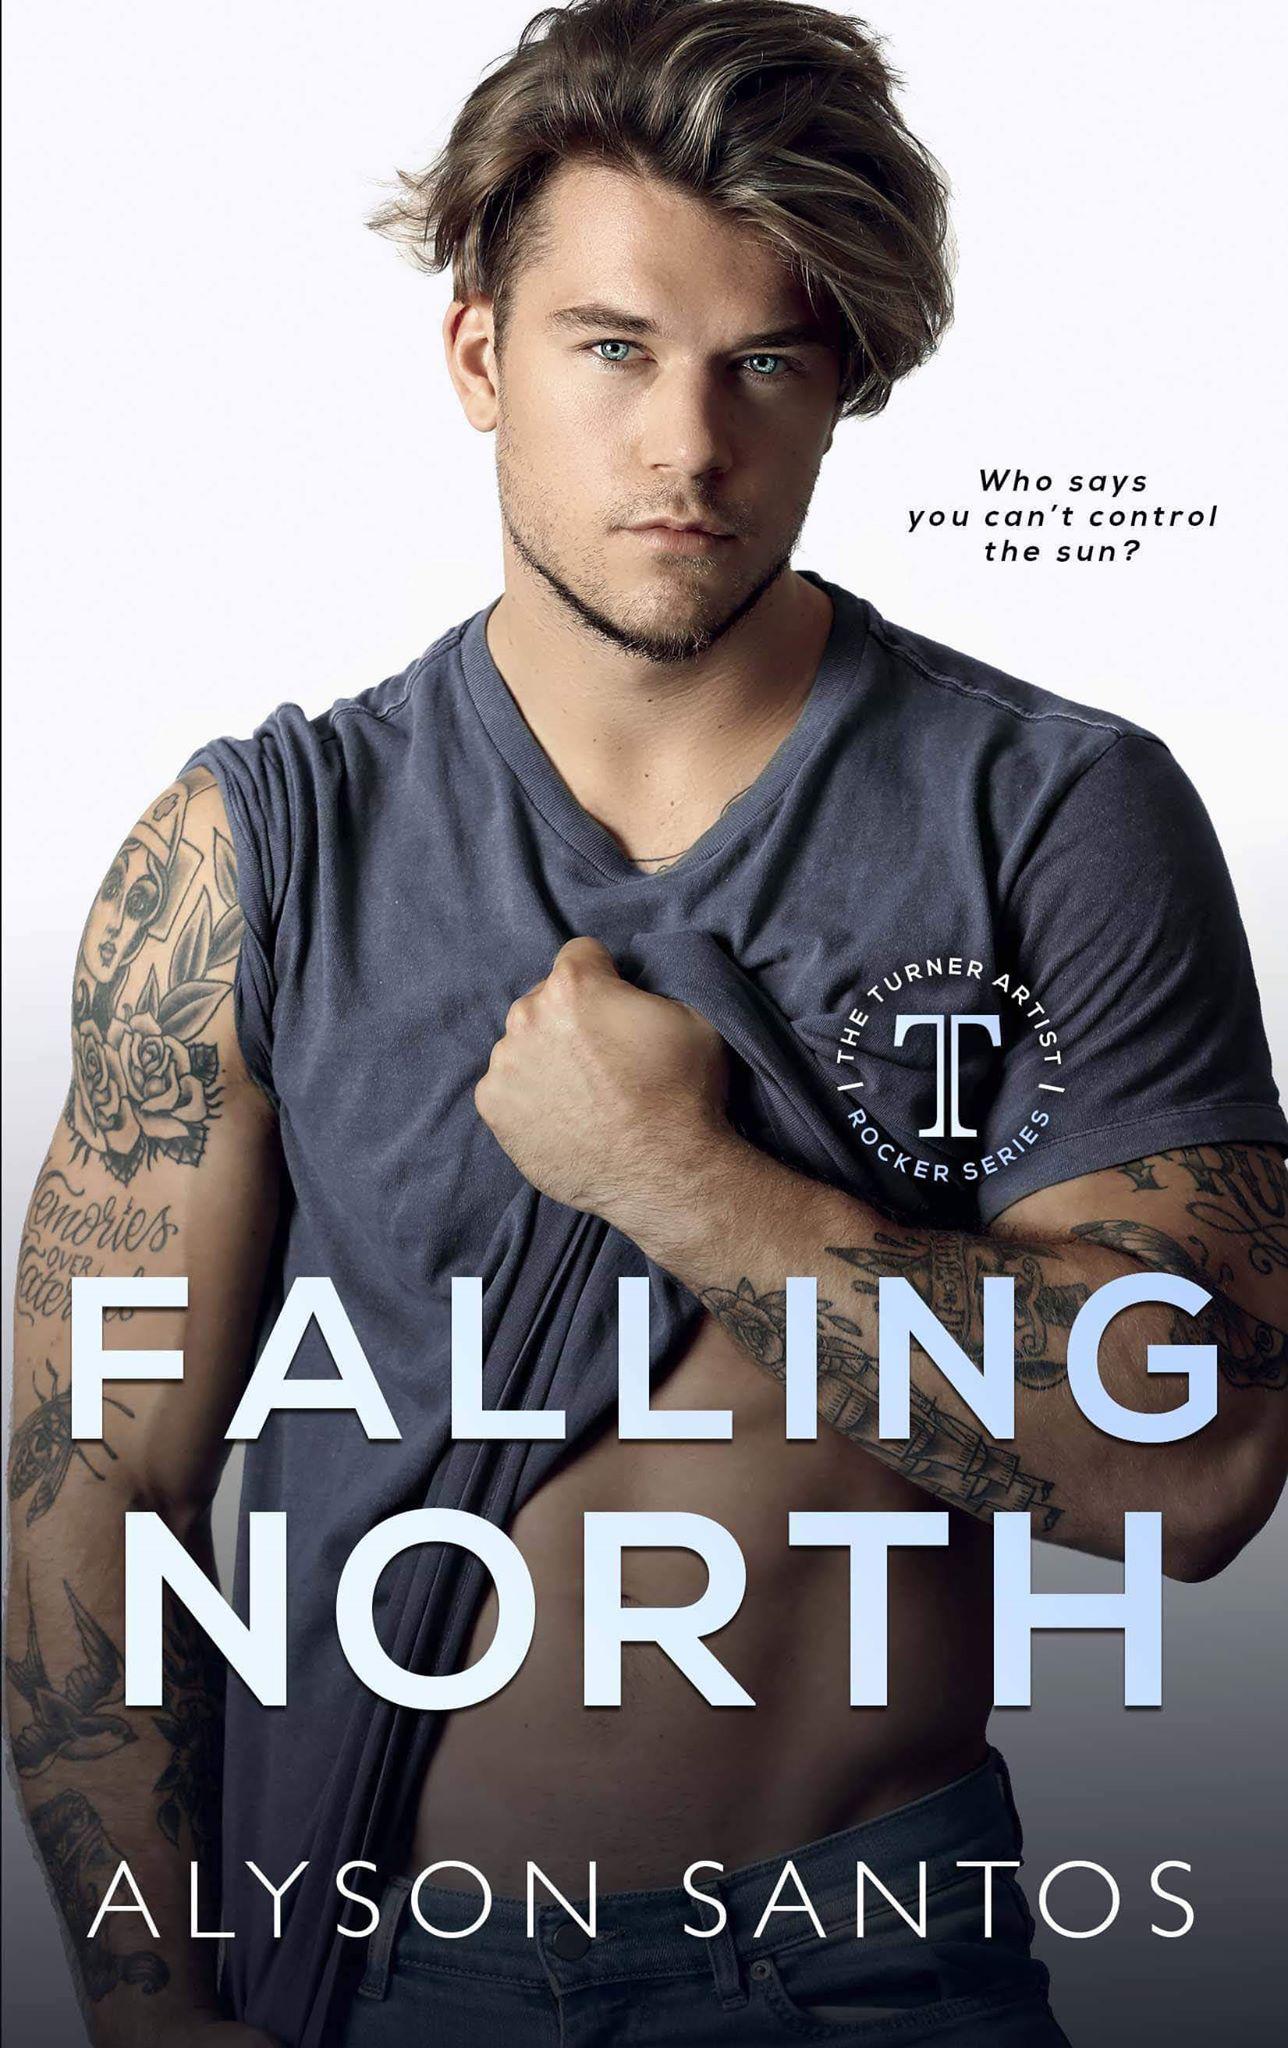 FALLING NORTH